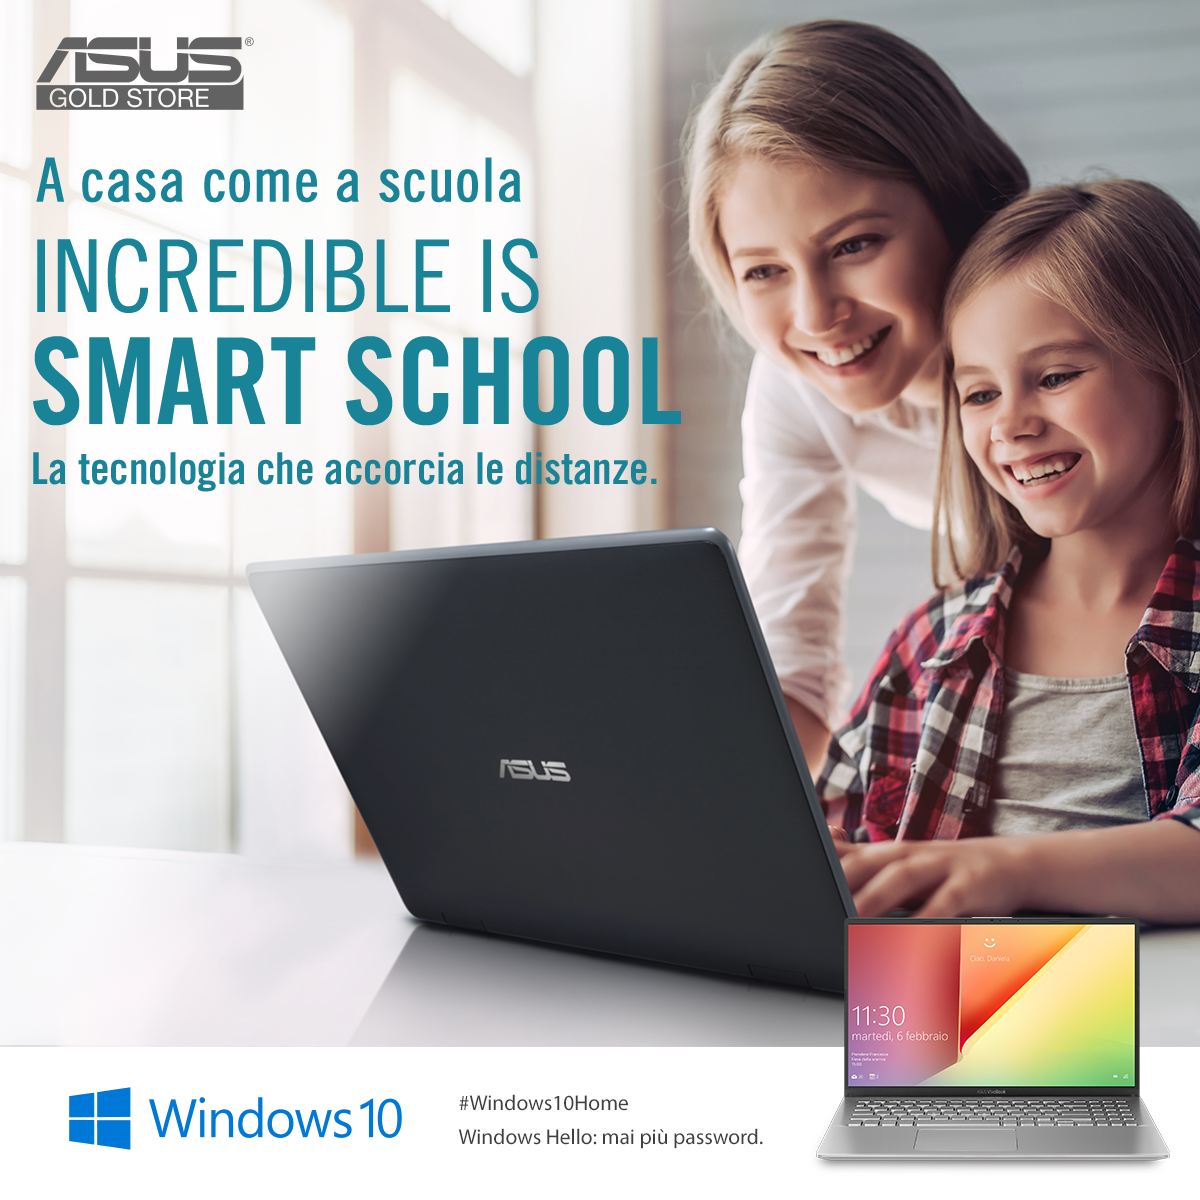 Asus, smart school, scuola digitale